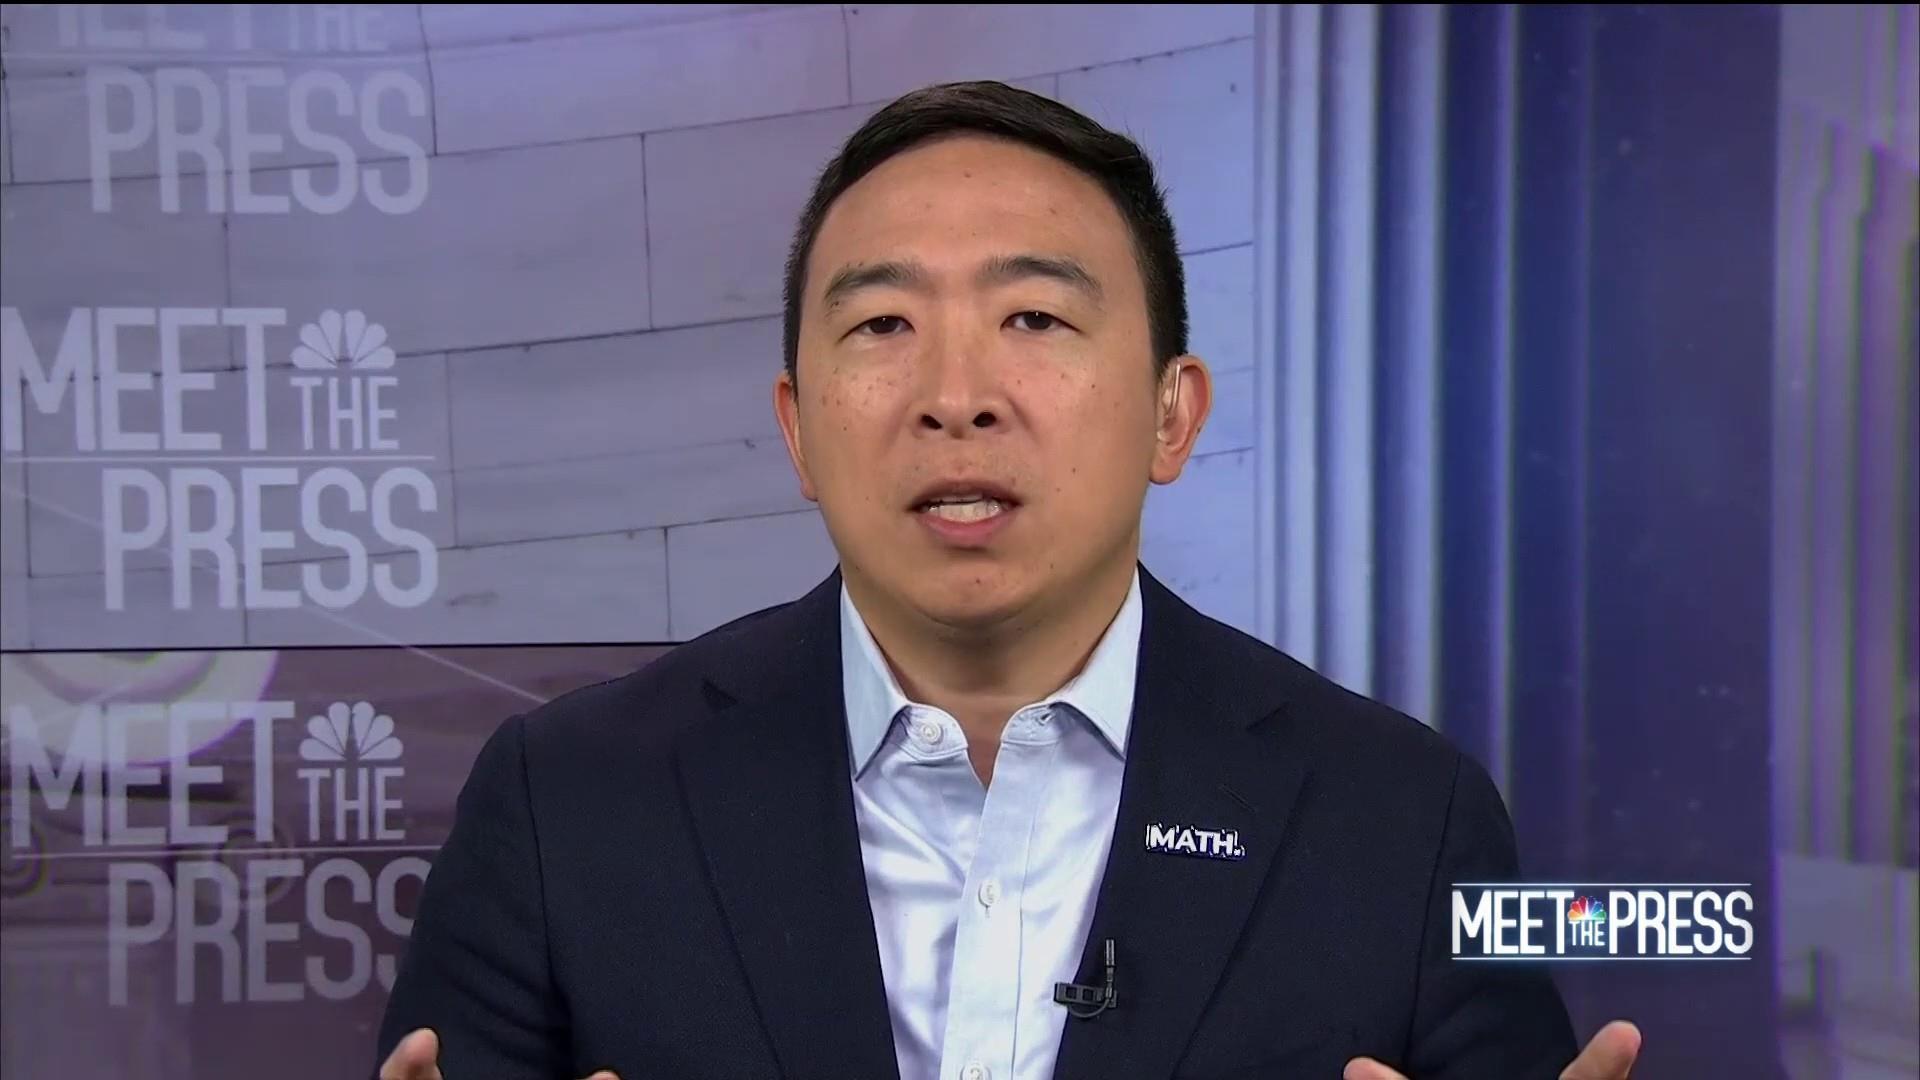 Full Yang: 'Hard-eyed realist' needed in 21st century